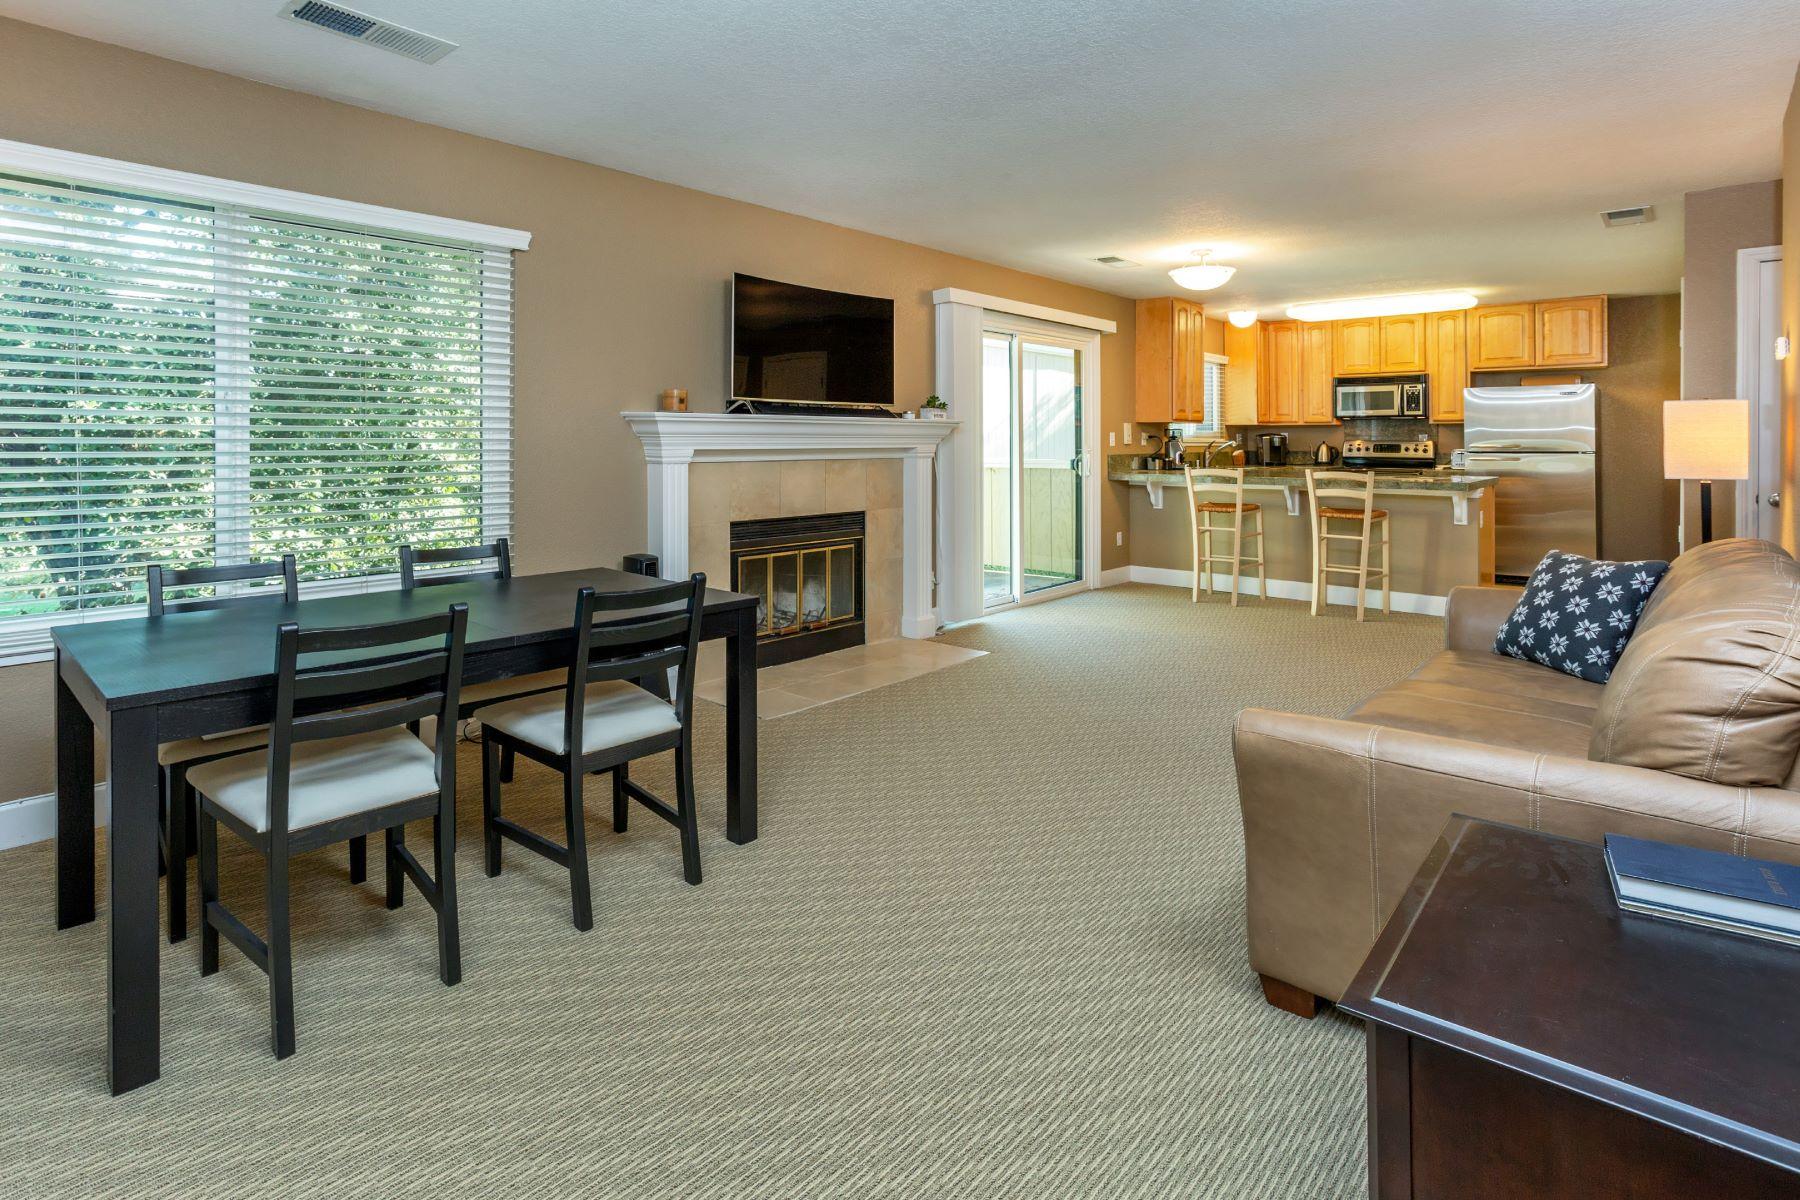 Condominiums for Sale at Rarely Available Top-Floor Condo 60 Hector Lane Novato, California 94949 United States